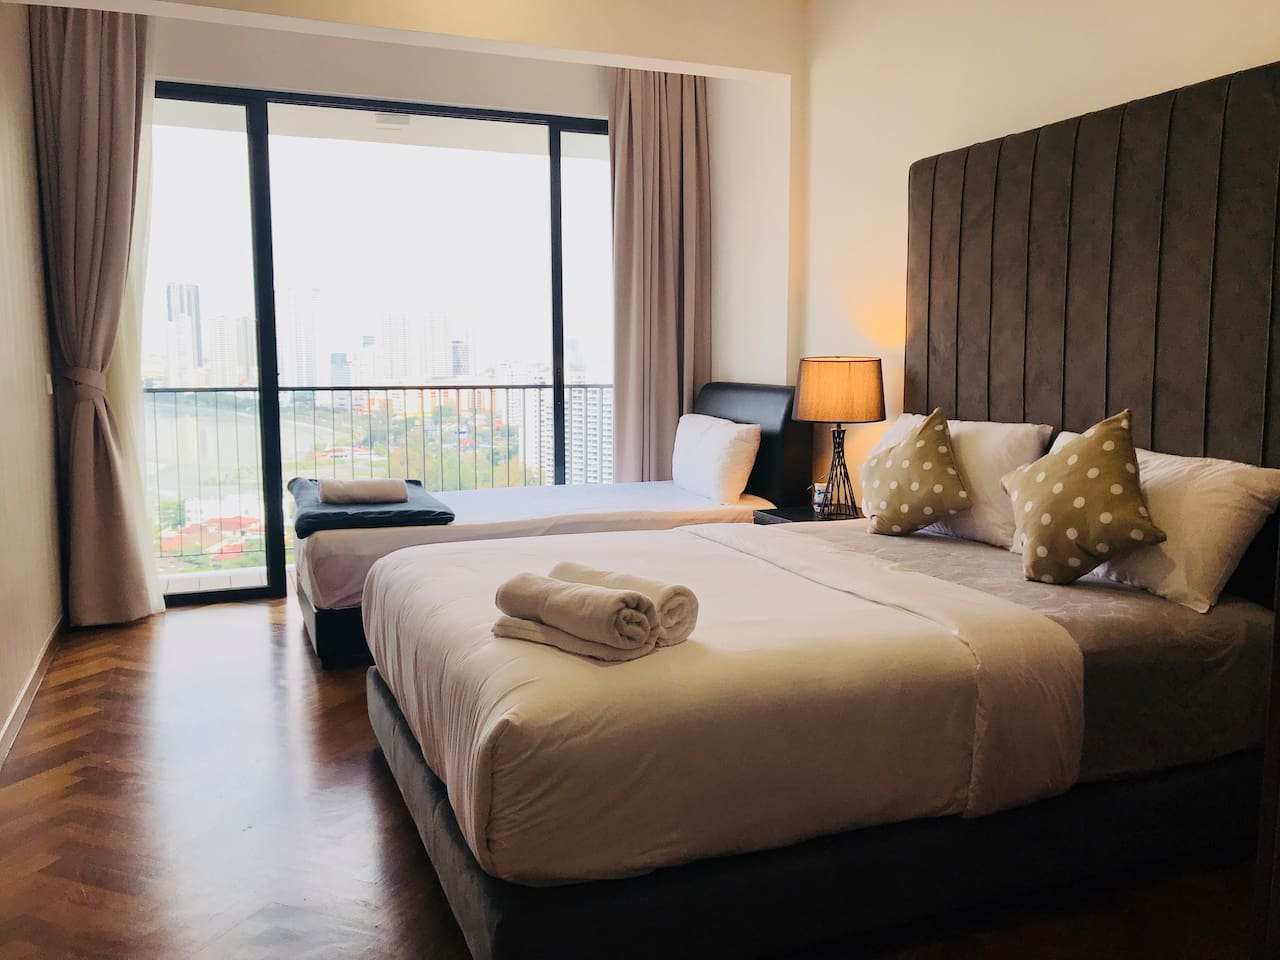 Master Bedroom with Seaview Balcony